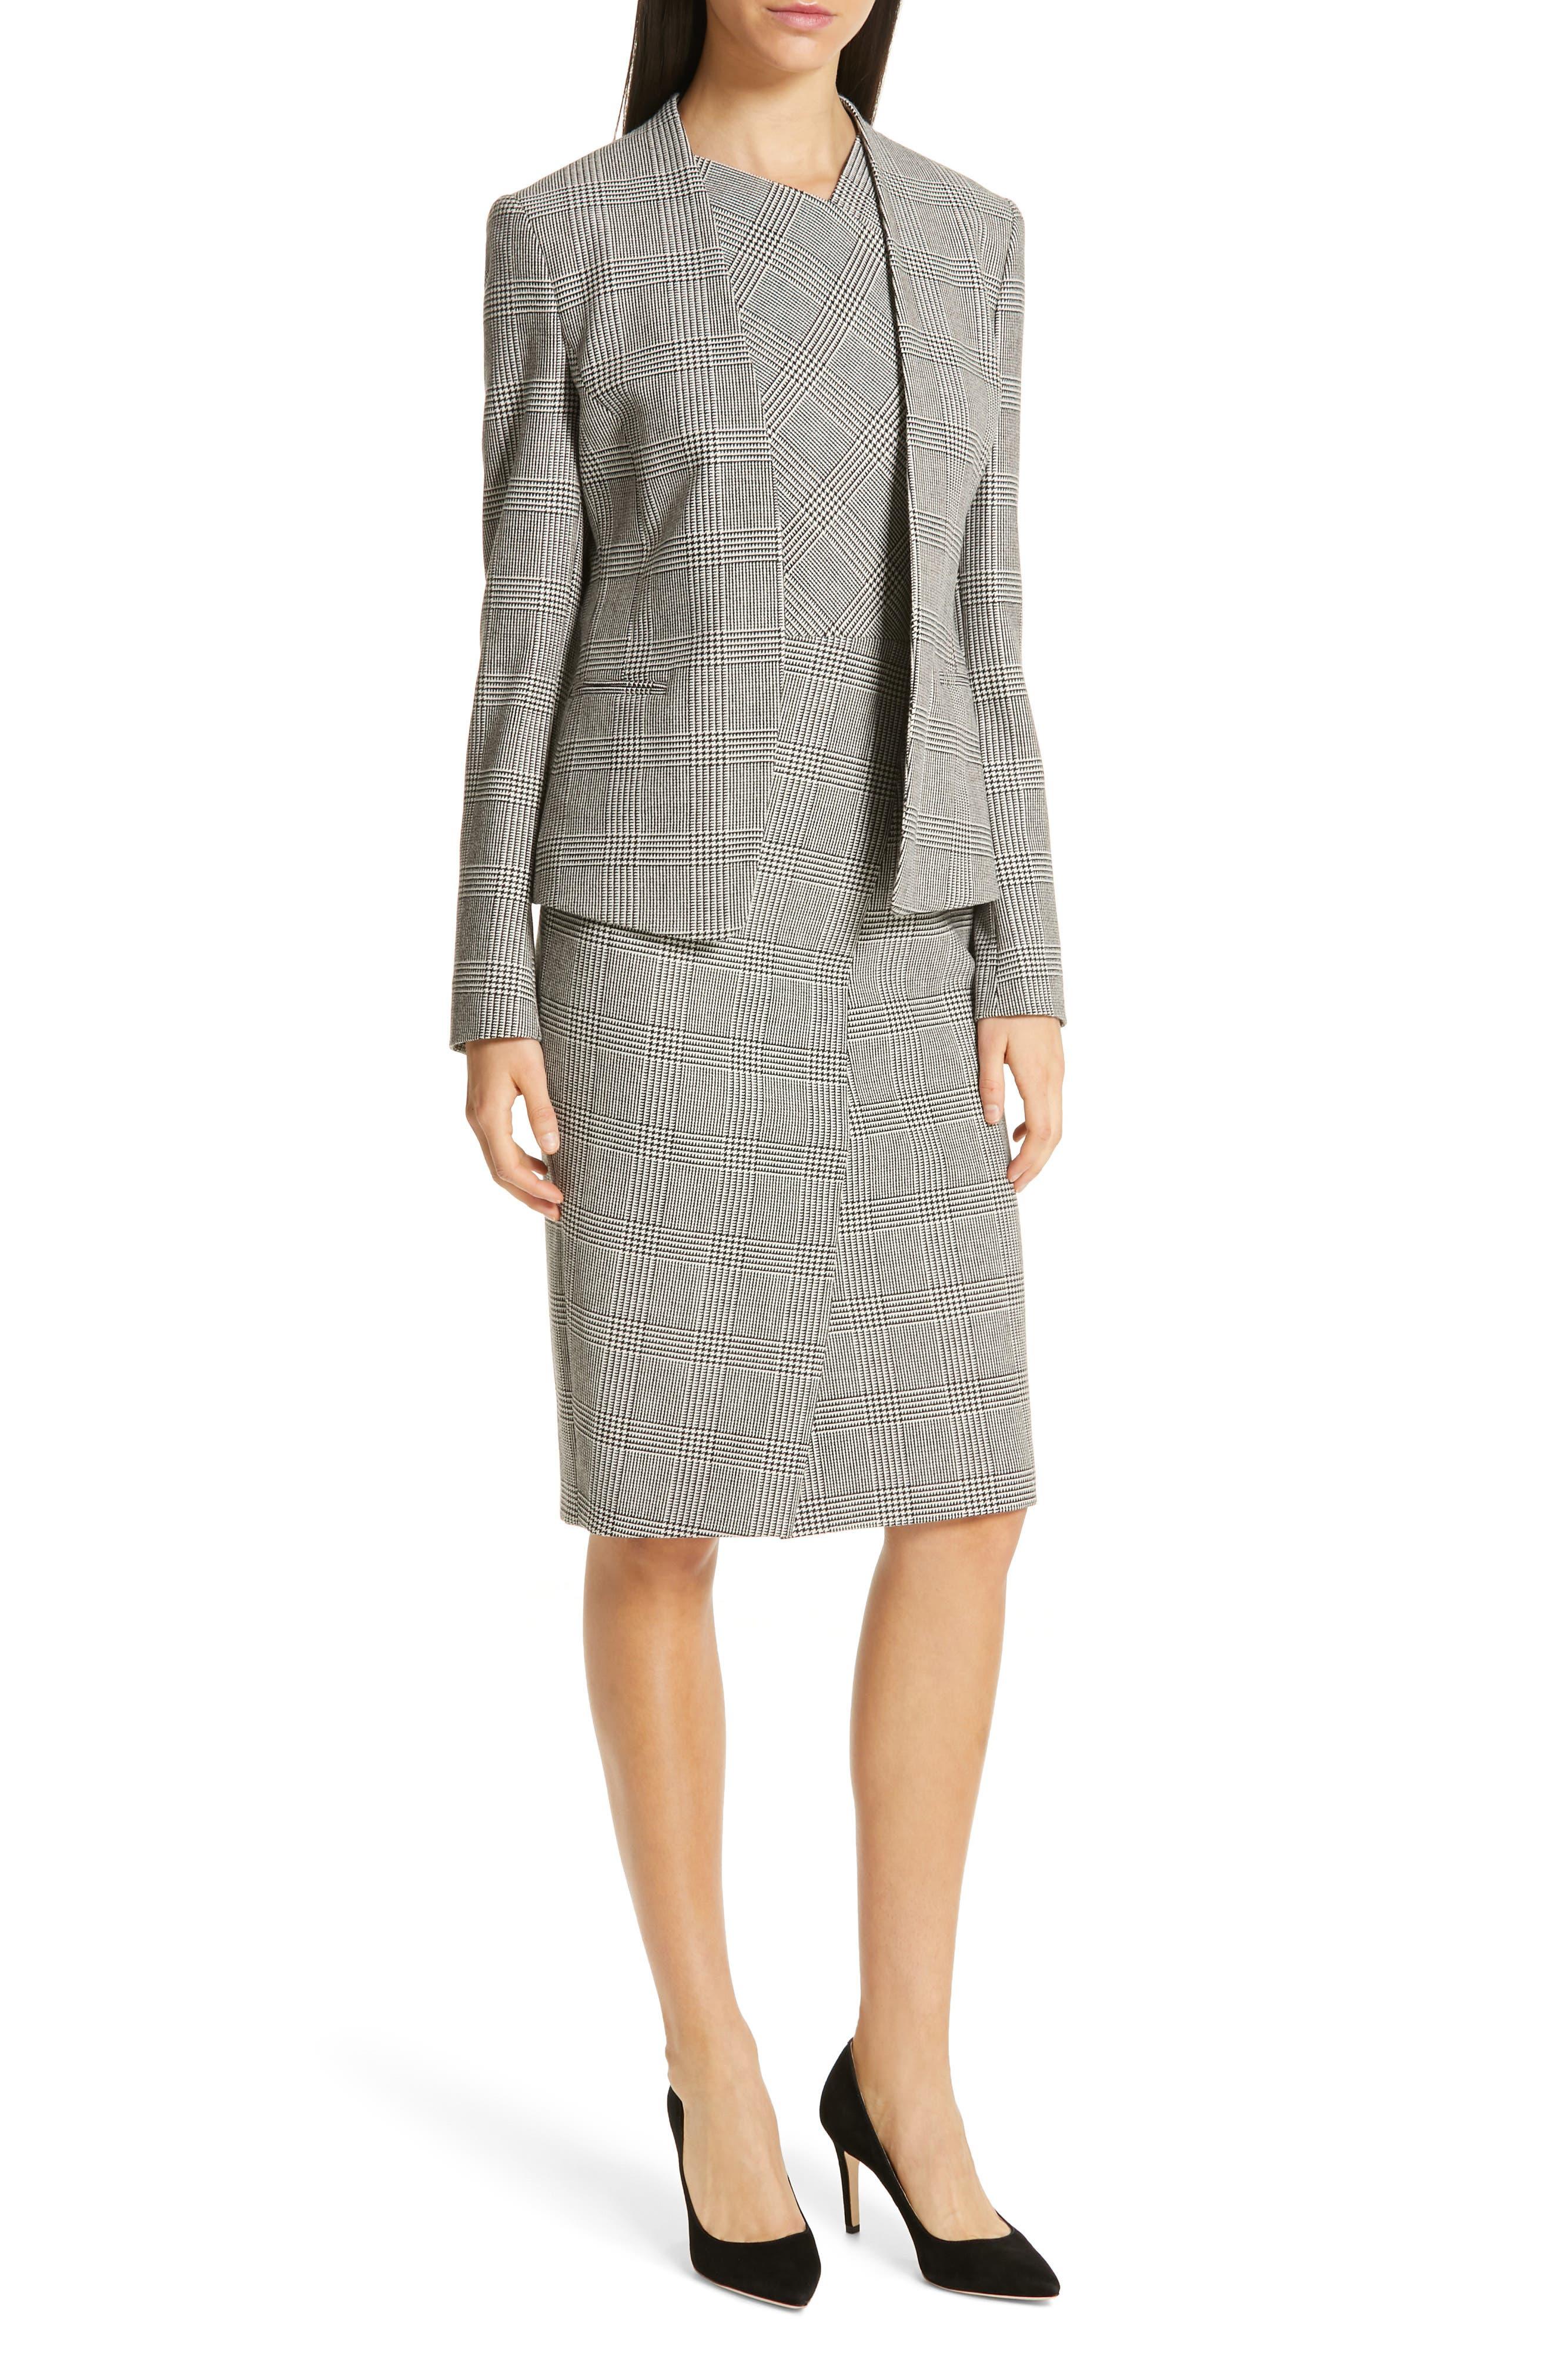 BOSS, Dechesta Glen Plaid Sheath Dress, Alternate thumbnail 8, color, 020